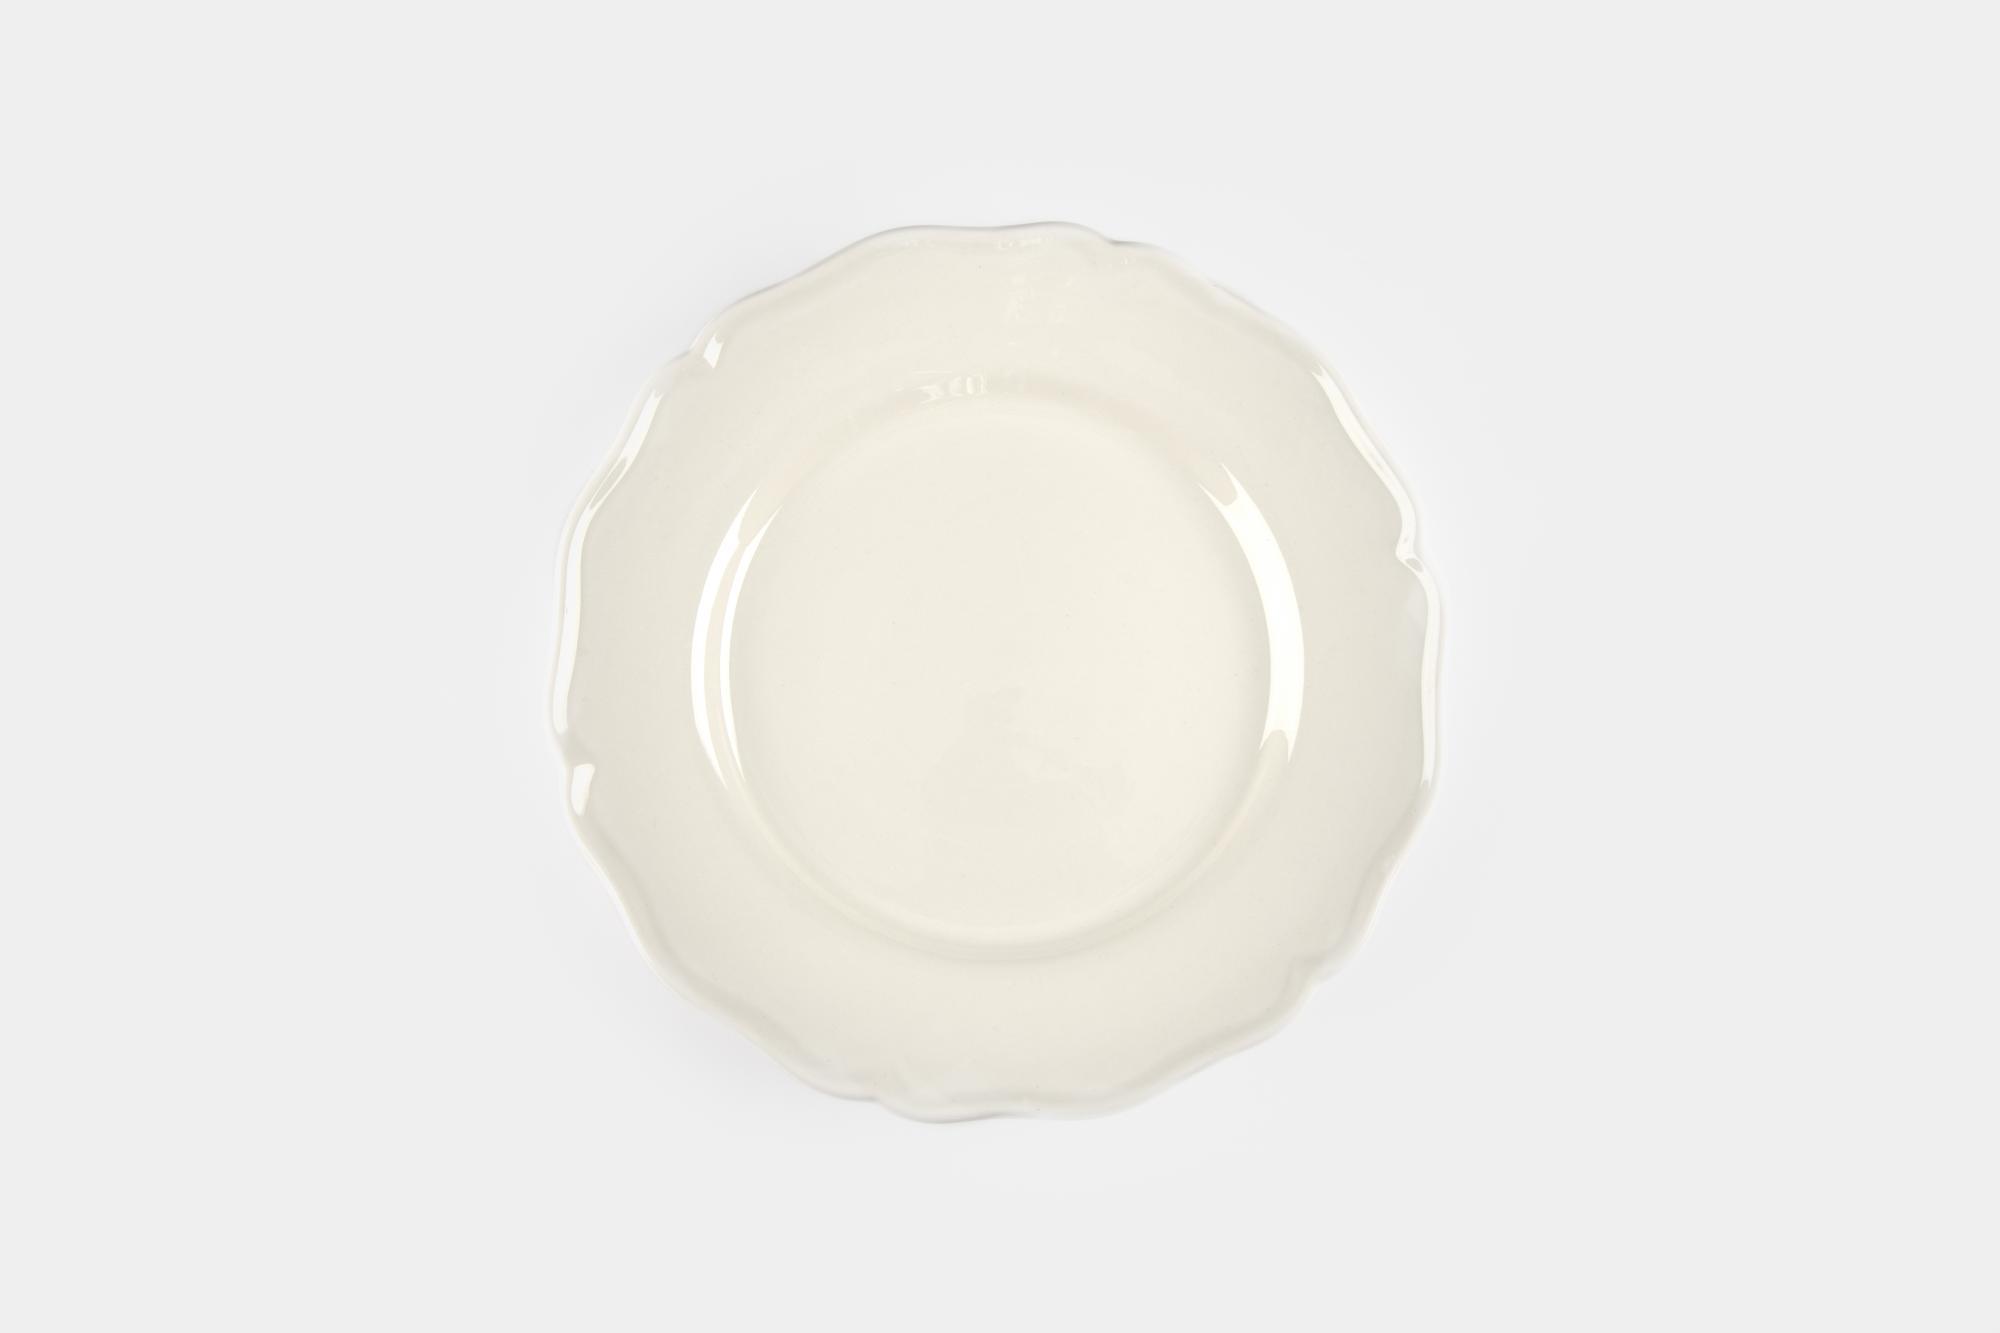 Bristol plate set - Image 1